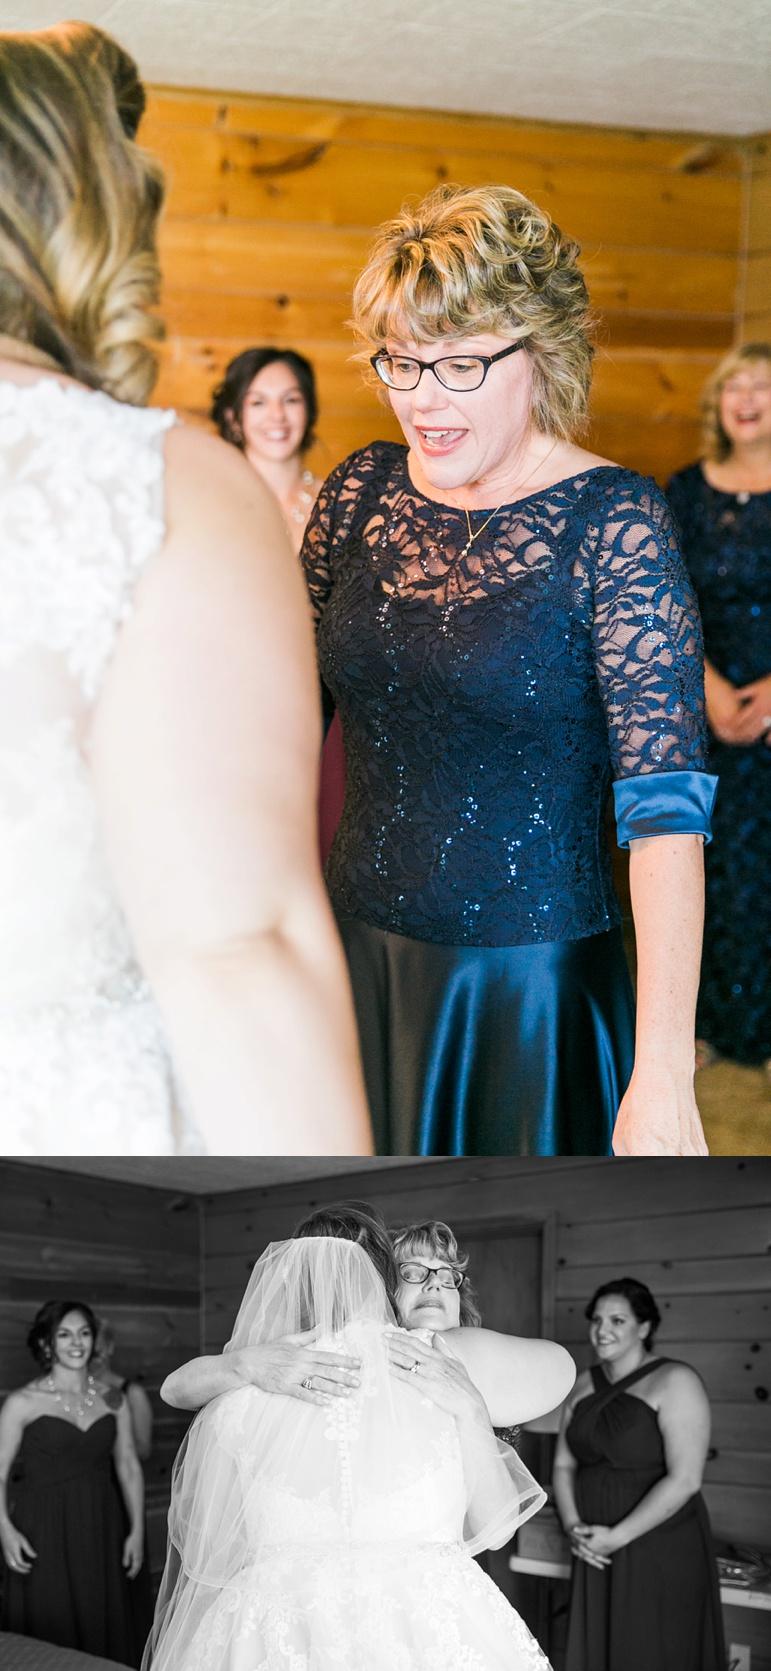 Stella Maris Catholic ChurchFish Creek WI and Gordon Lodge Baileys Harbor Door County Wisconsin Wedding, Ebb & Flow Green Bay Florist